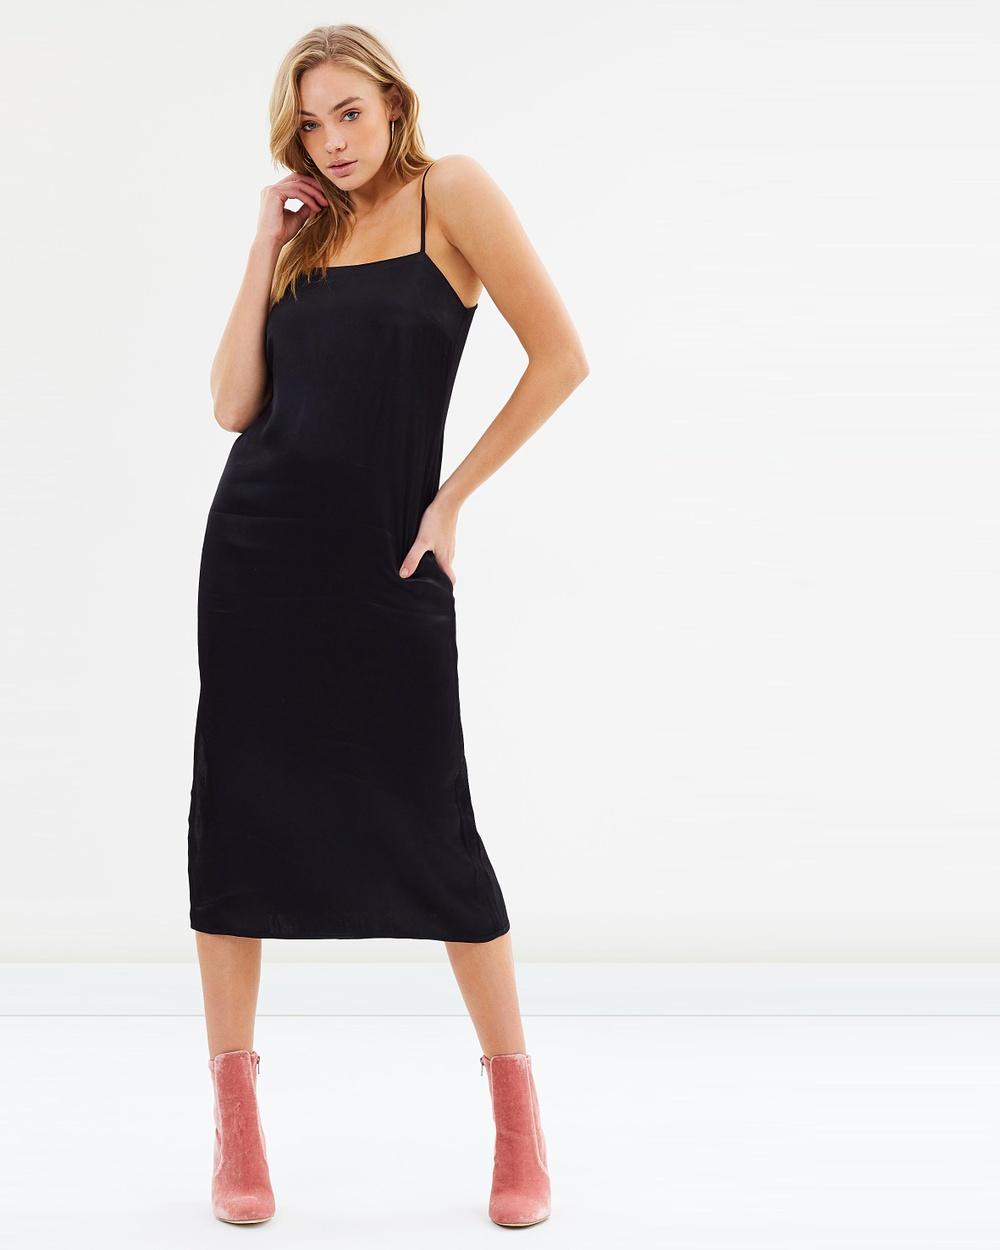 Bardot Vania Strap Dress Dresses Black Vania Strap Dress